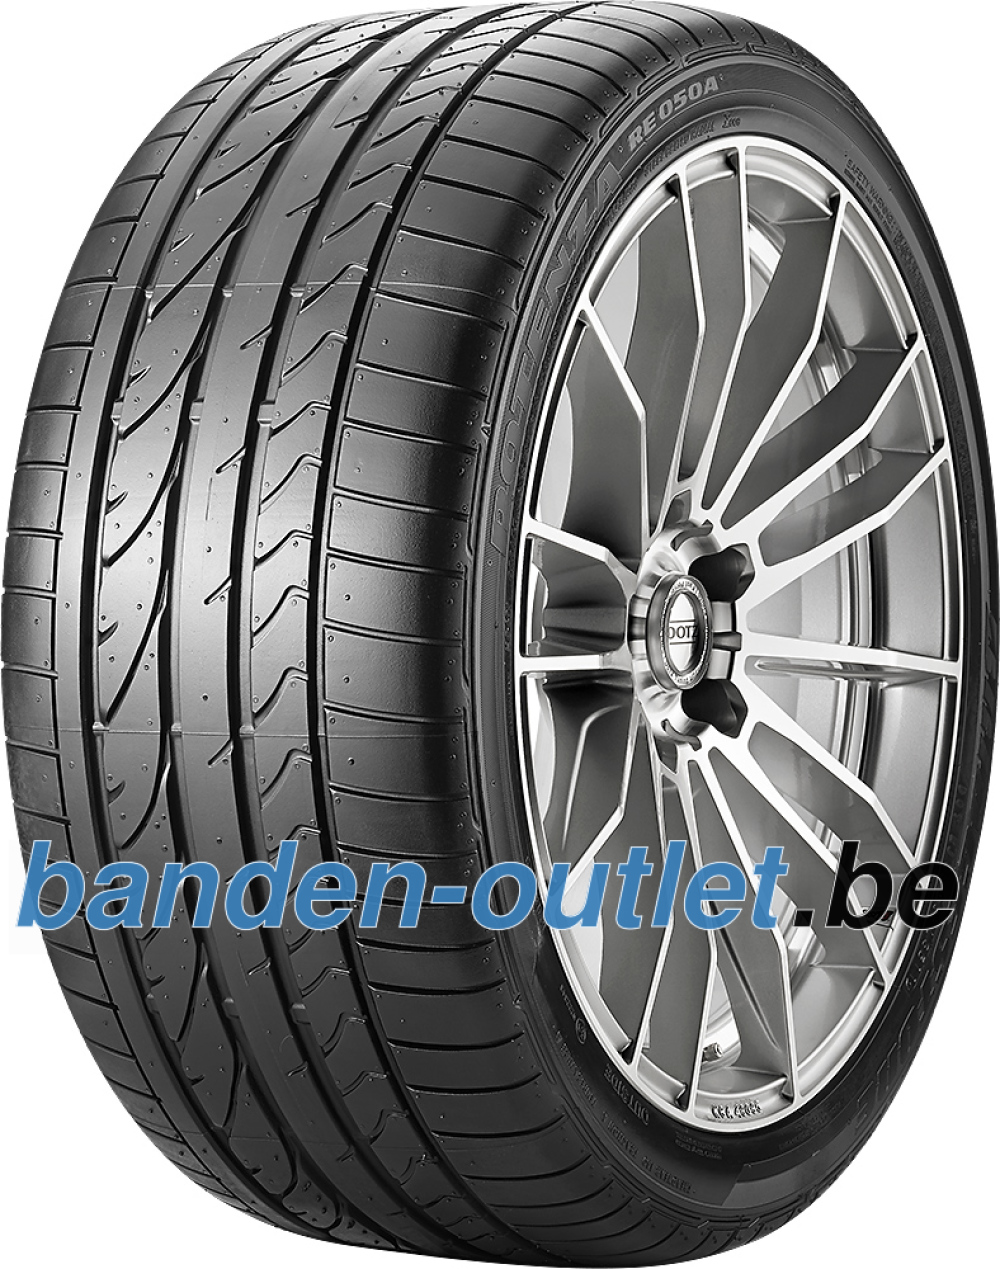 Bridgestone Potenza RE 050 A Ecopia RFT ( 225/45 R17 91W *, runflat, met velgrandbescherming (MFS) )